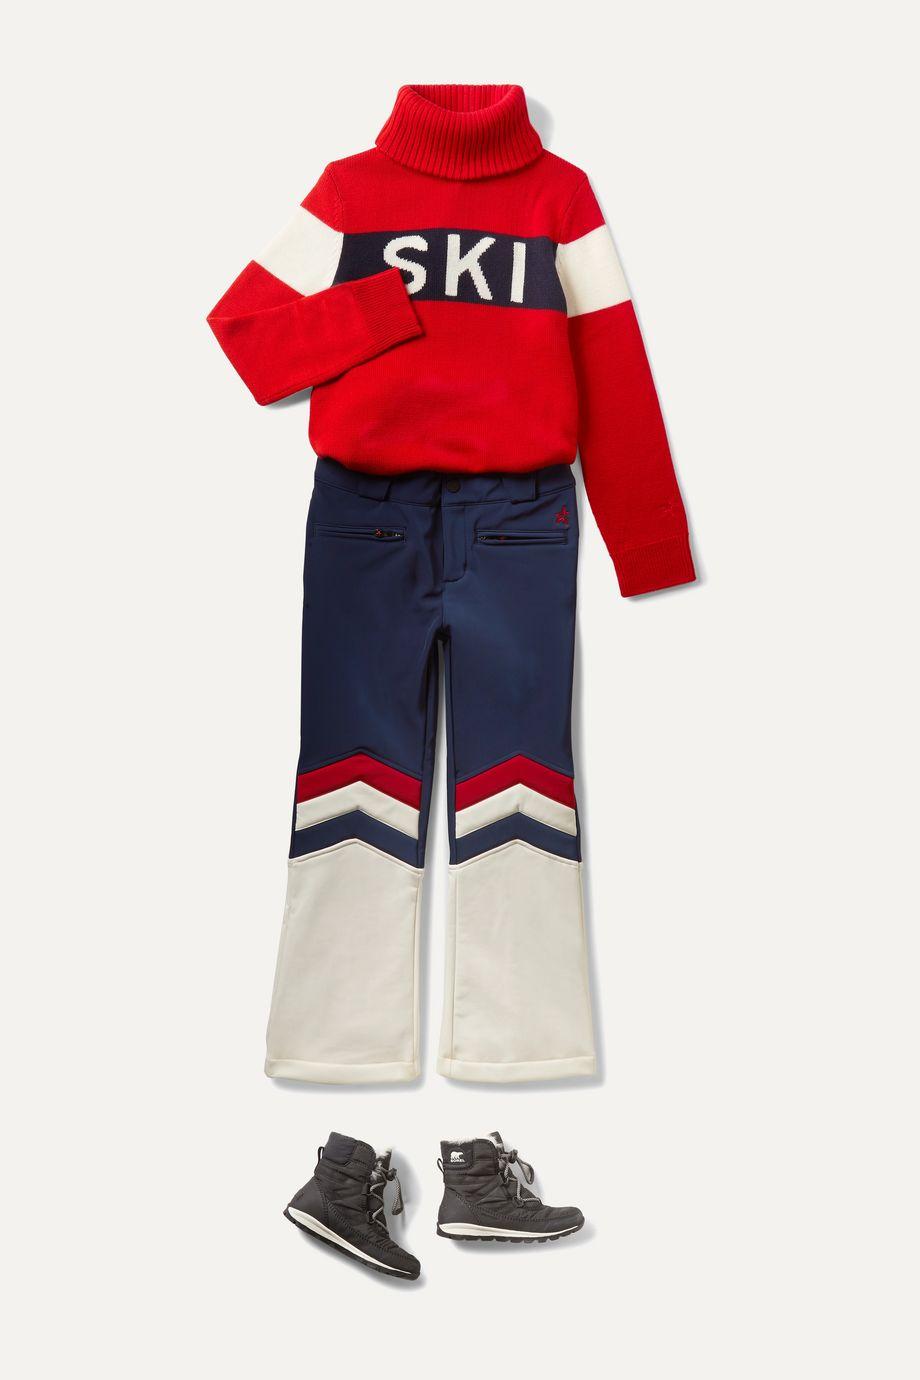 Perfect Moment Kids Ages 6 - 12 Ski intarsia merino wool turtleneck sweater